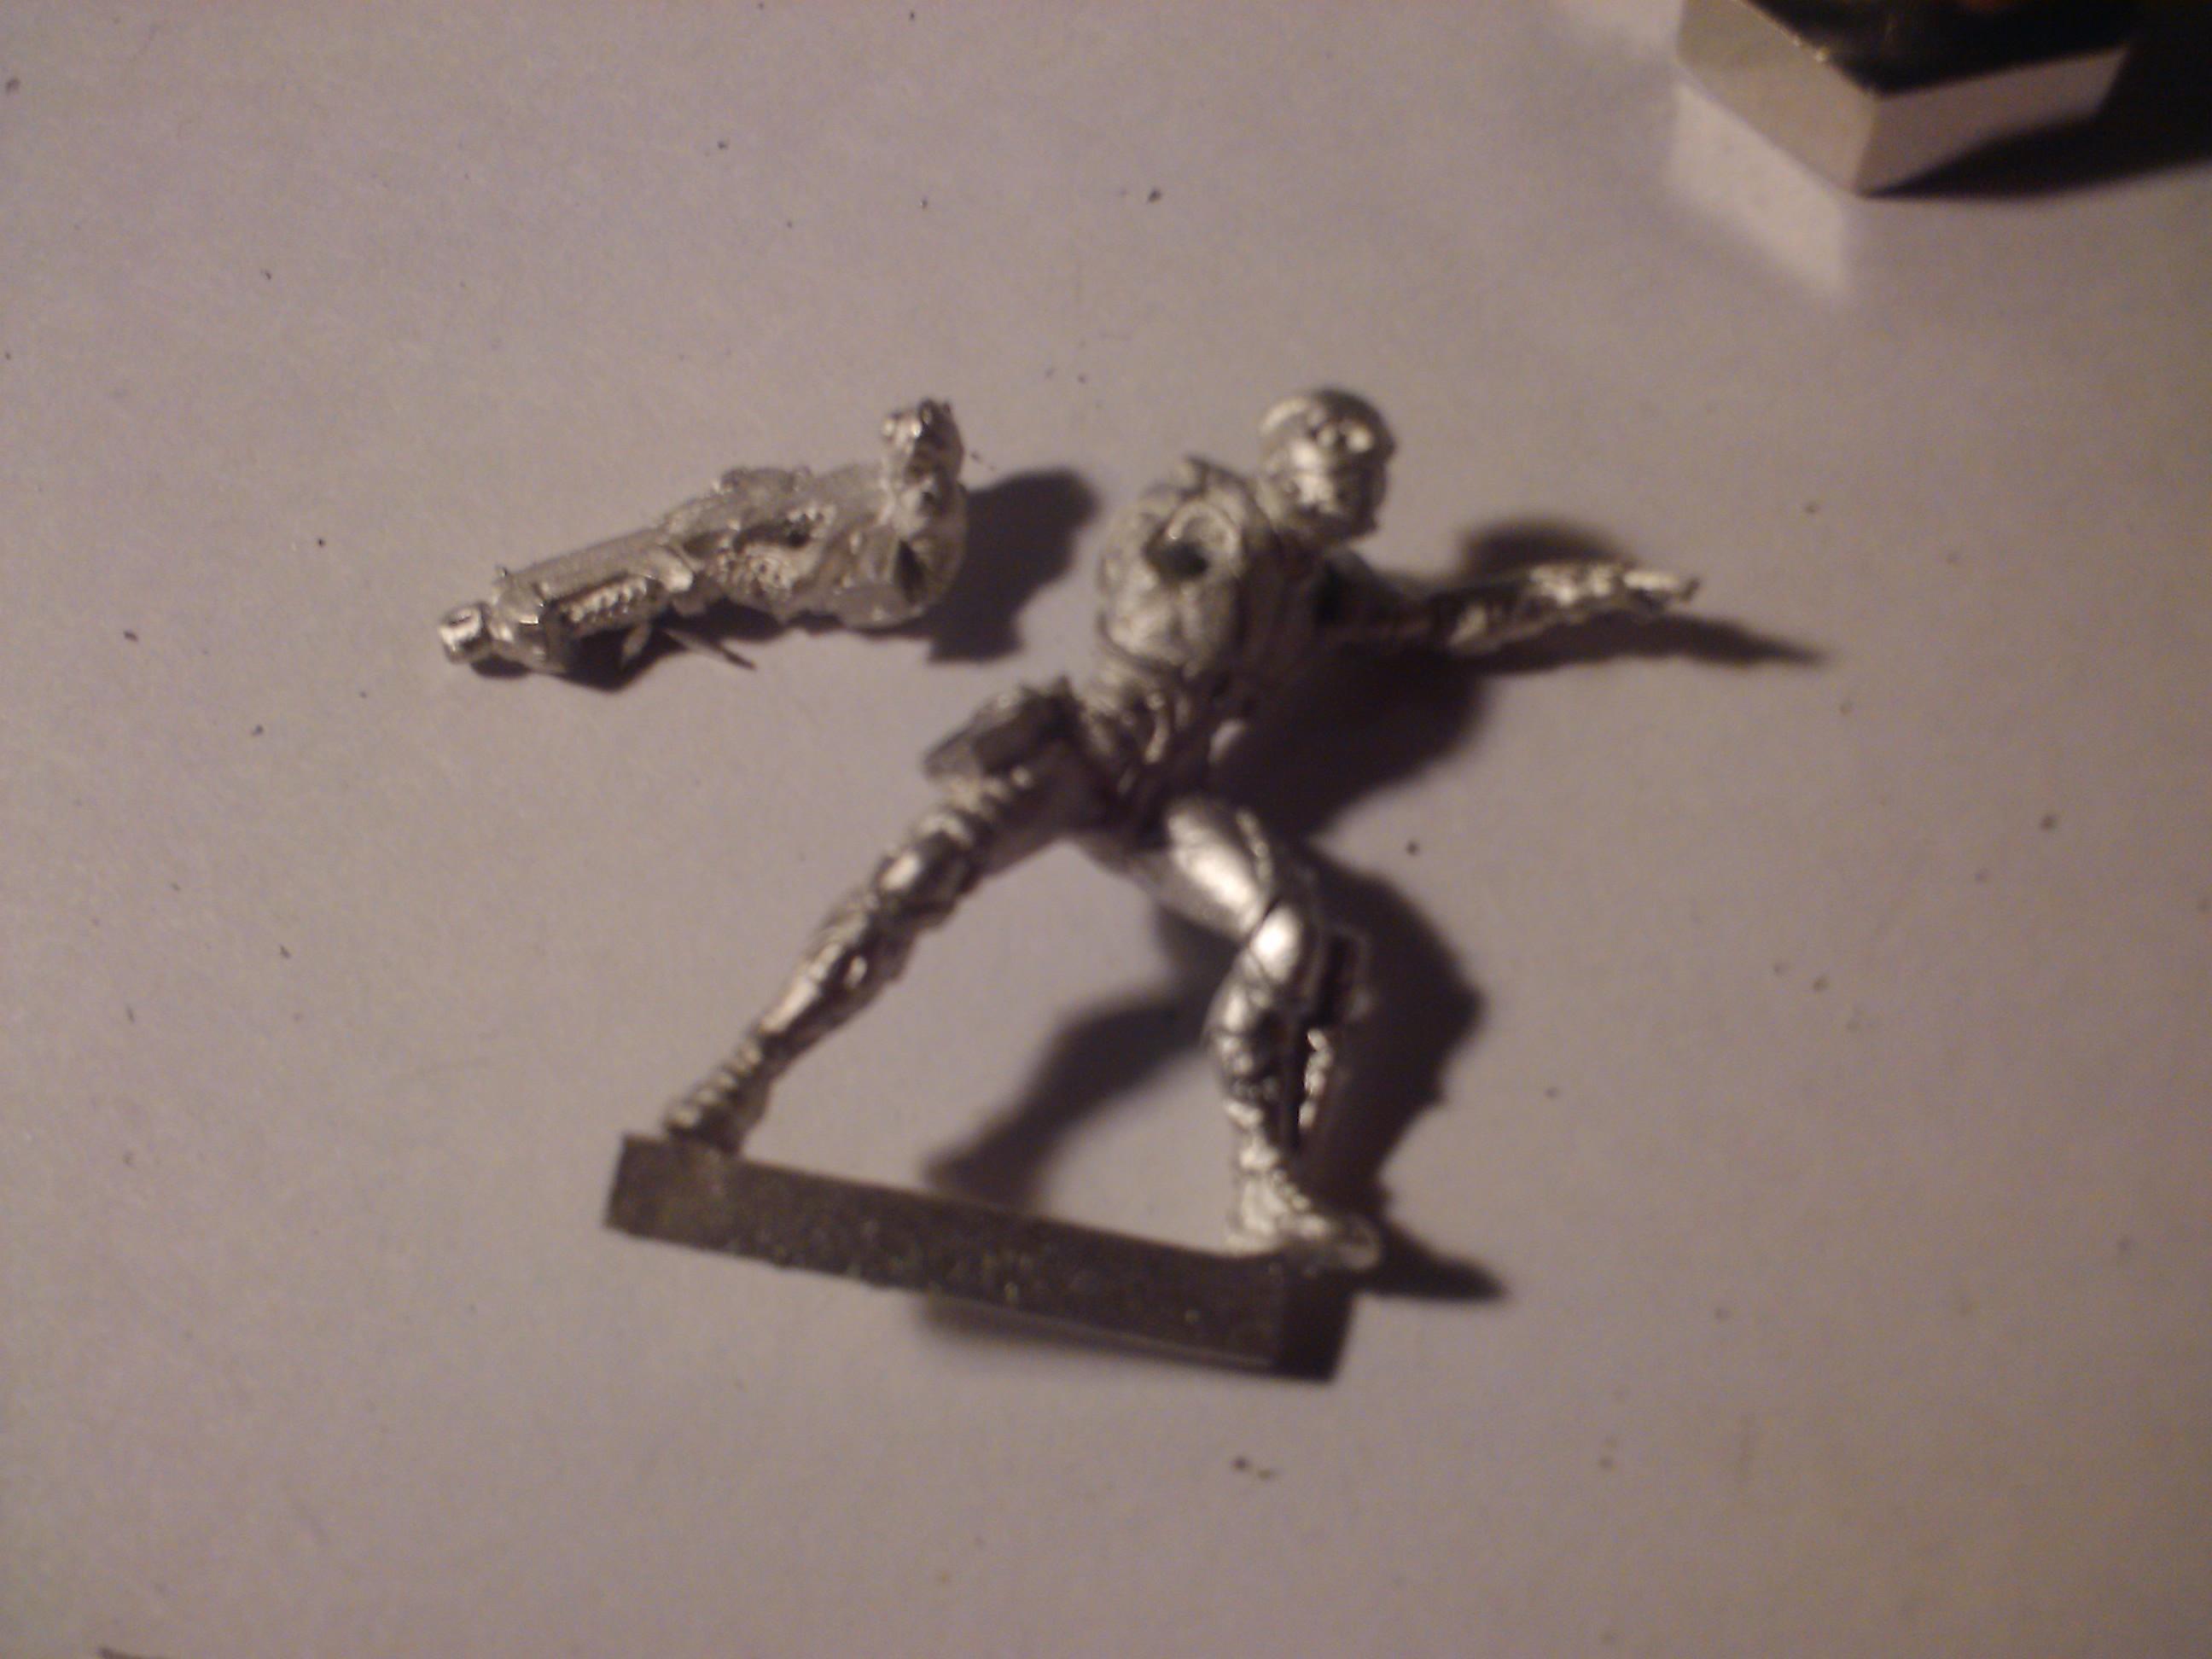 Build, Commission, Corvis Belli, Infinity, Miniature, Yu Jing